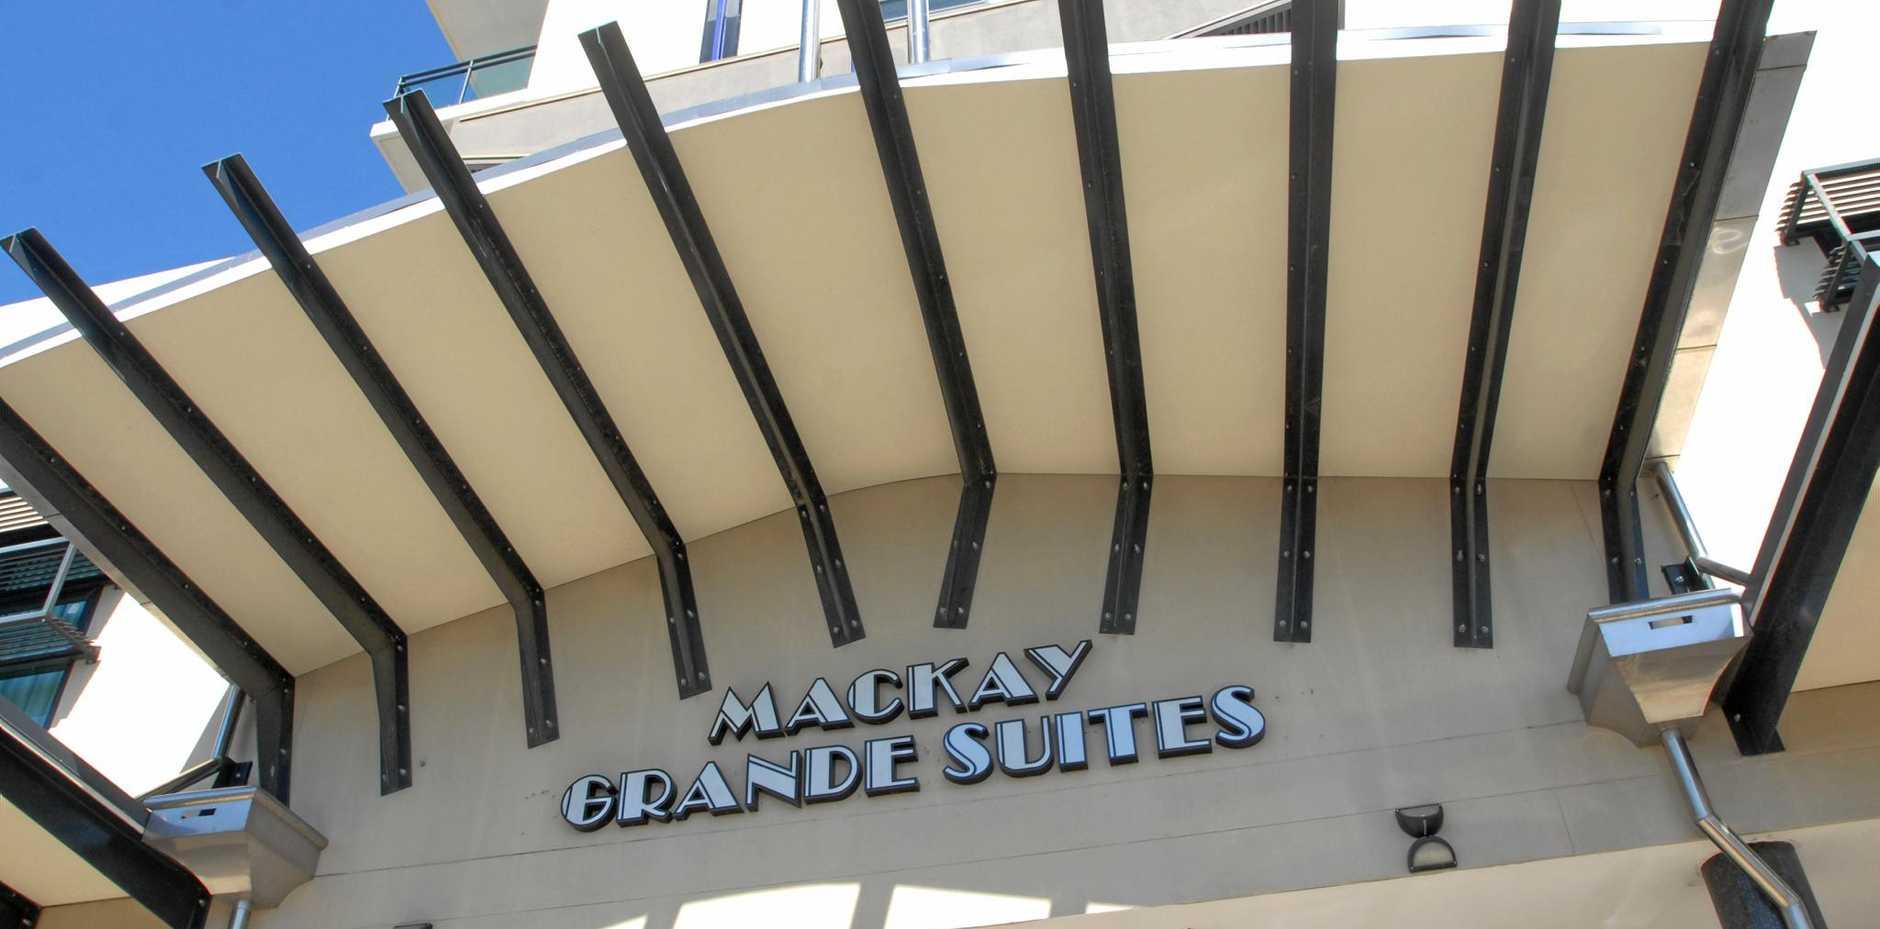 Mackay Grande Suites Photo Peter Holt / Daily Mercury 250111244